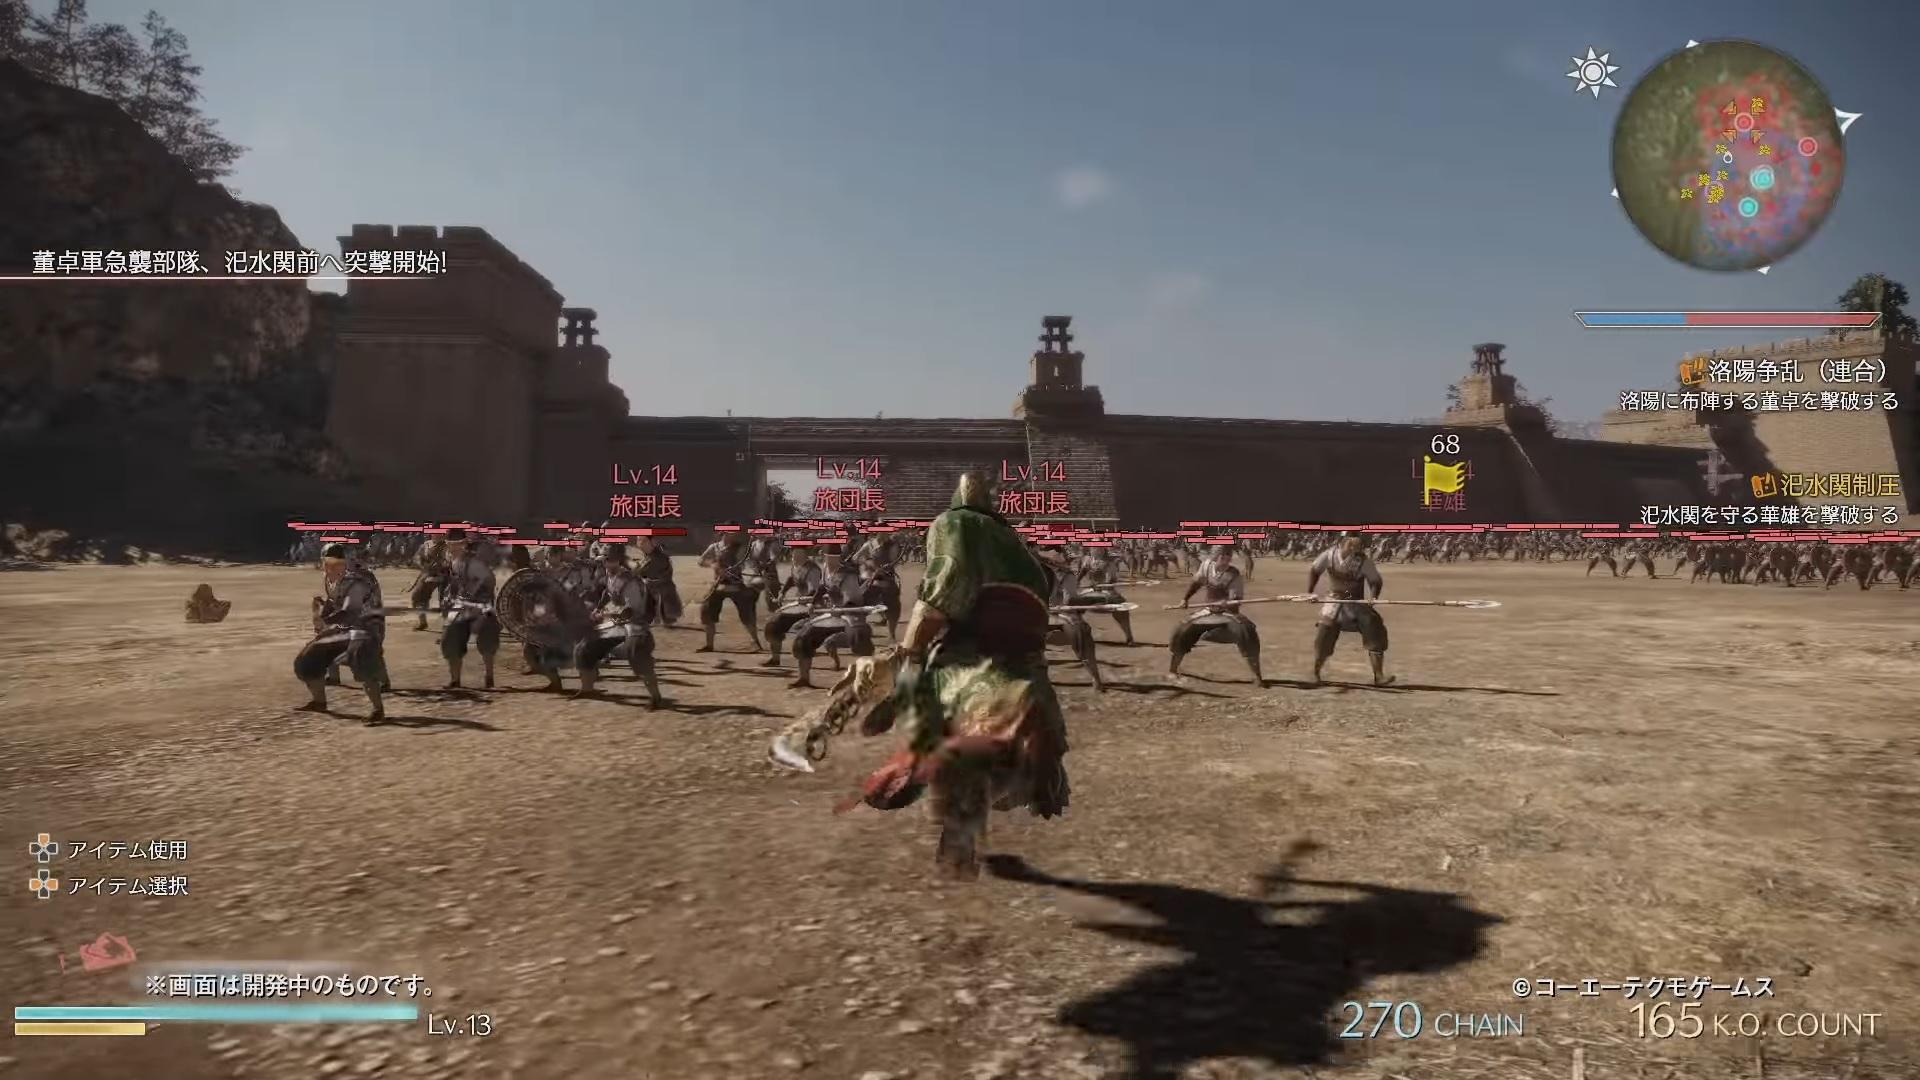 Witness eight minutes of Dynasty Warriors 9's open-world gameplay screenshot